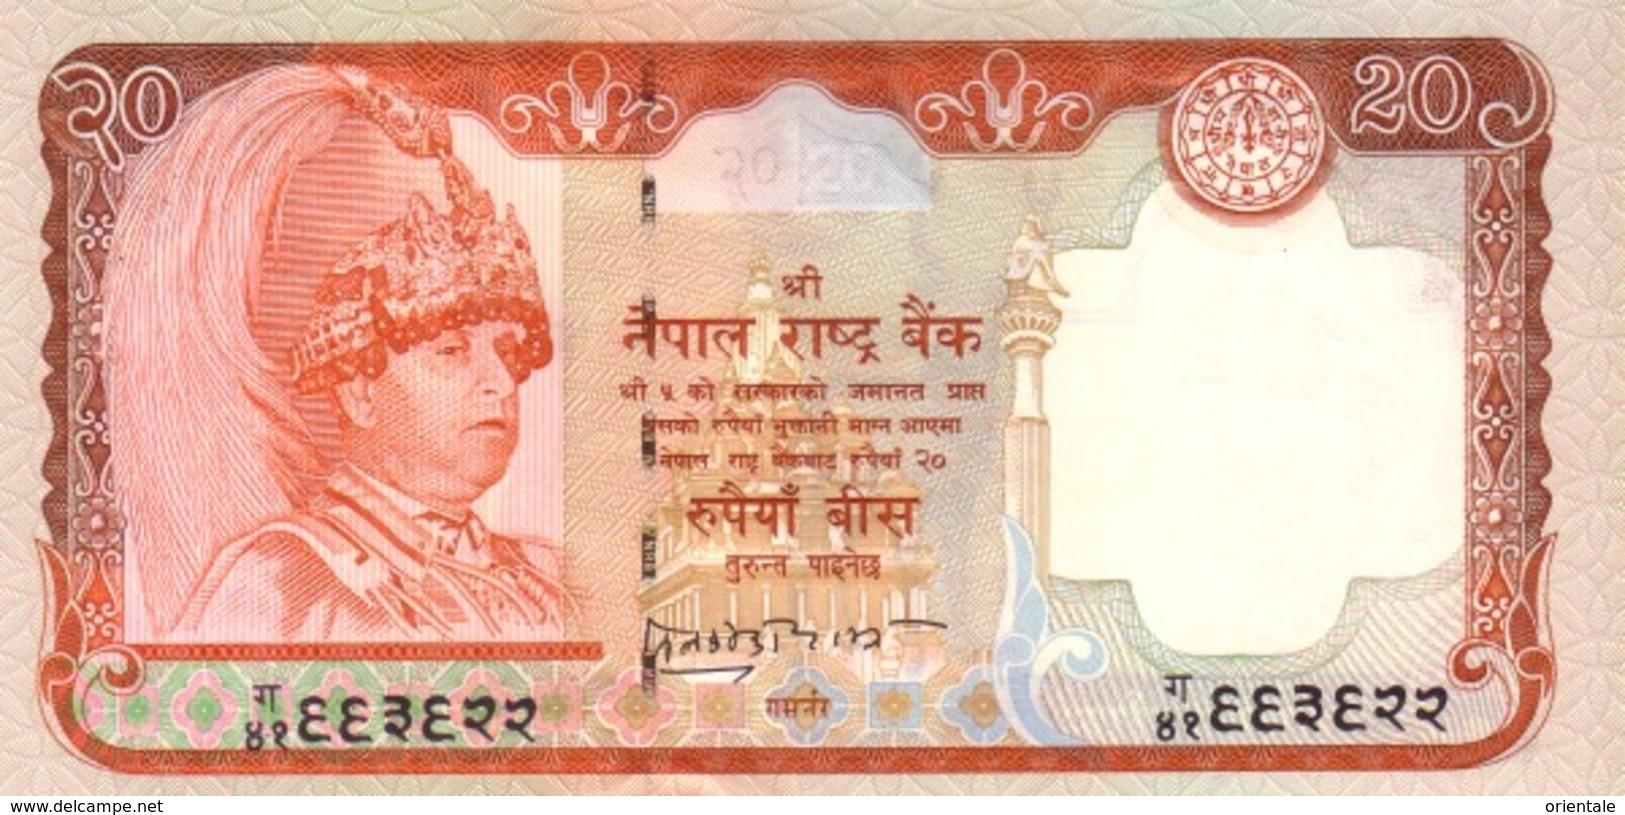 NEPAL P. 47b 20 R 2002 UNC - Nepal